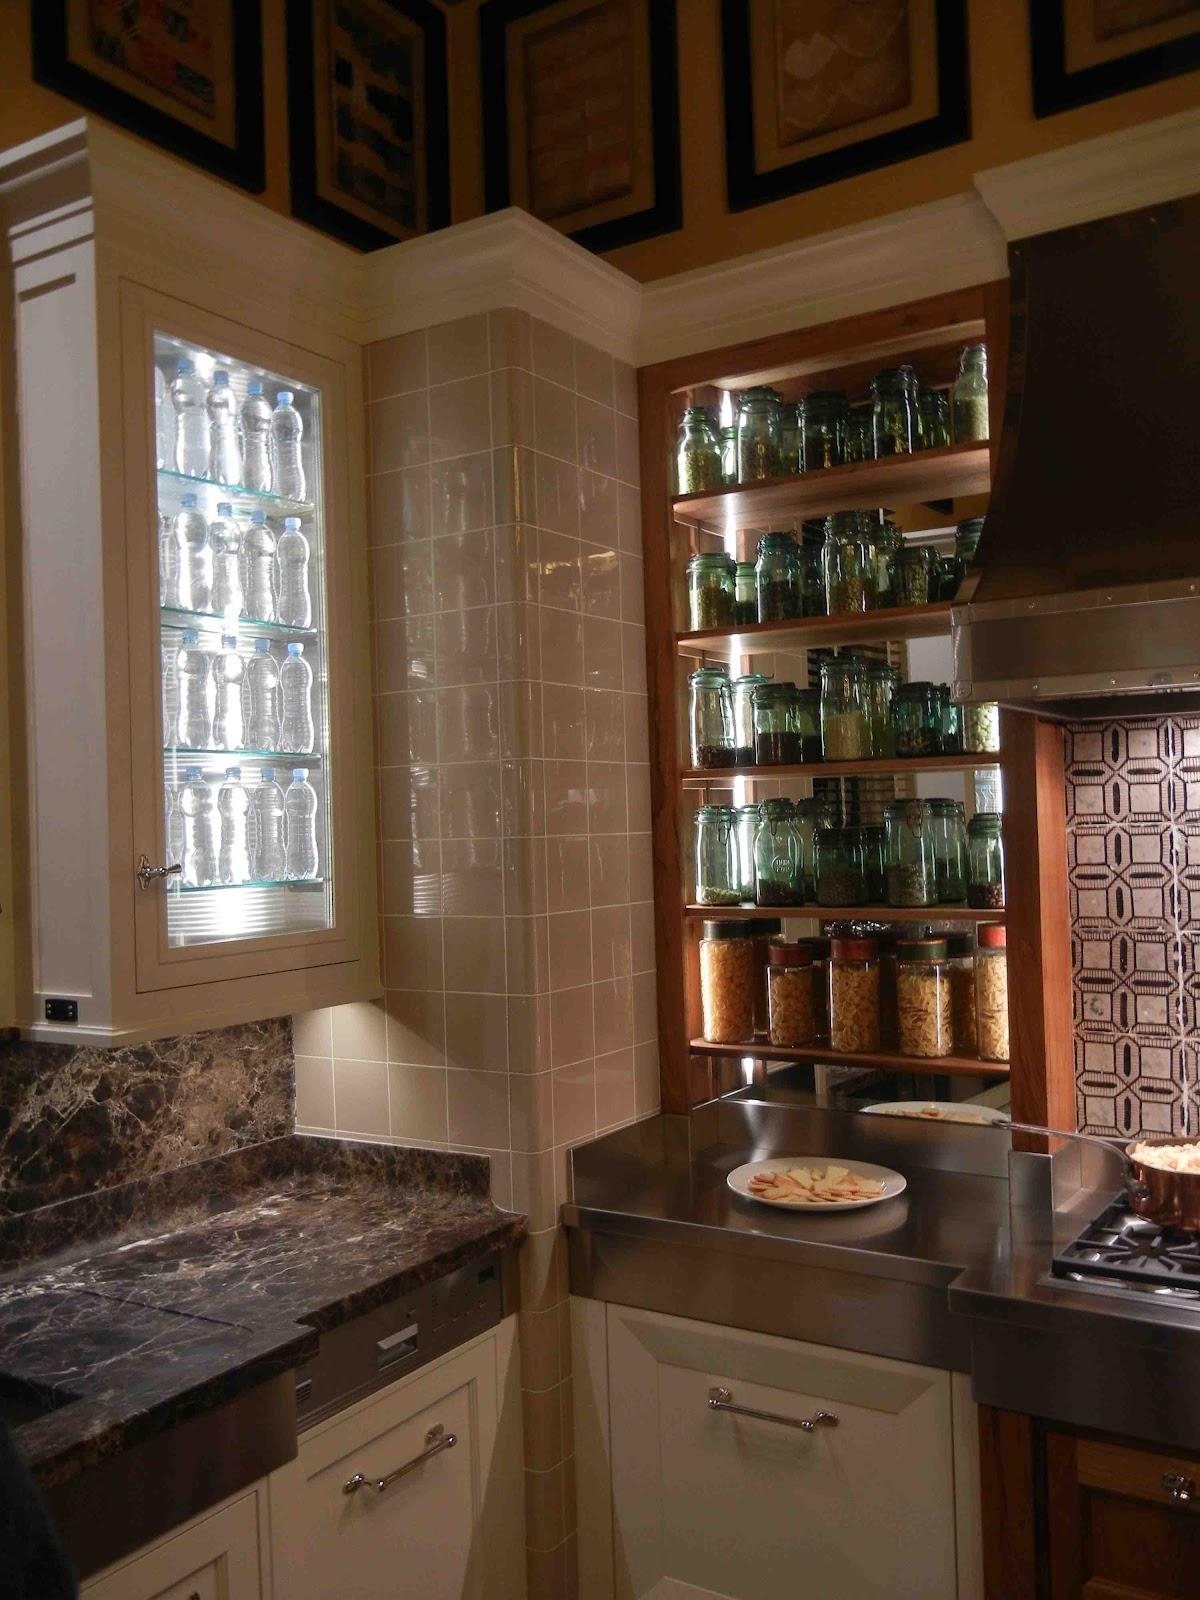 Io amo firenze le cucine e i bagni di barthel - Cucine e bagni ...